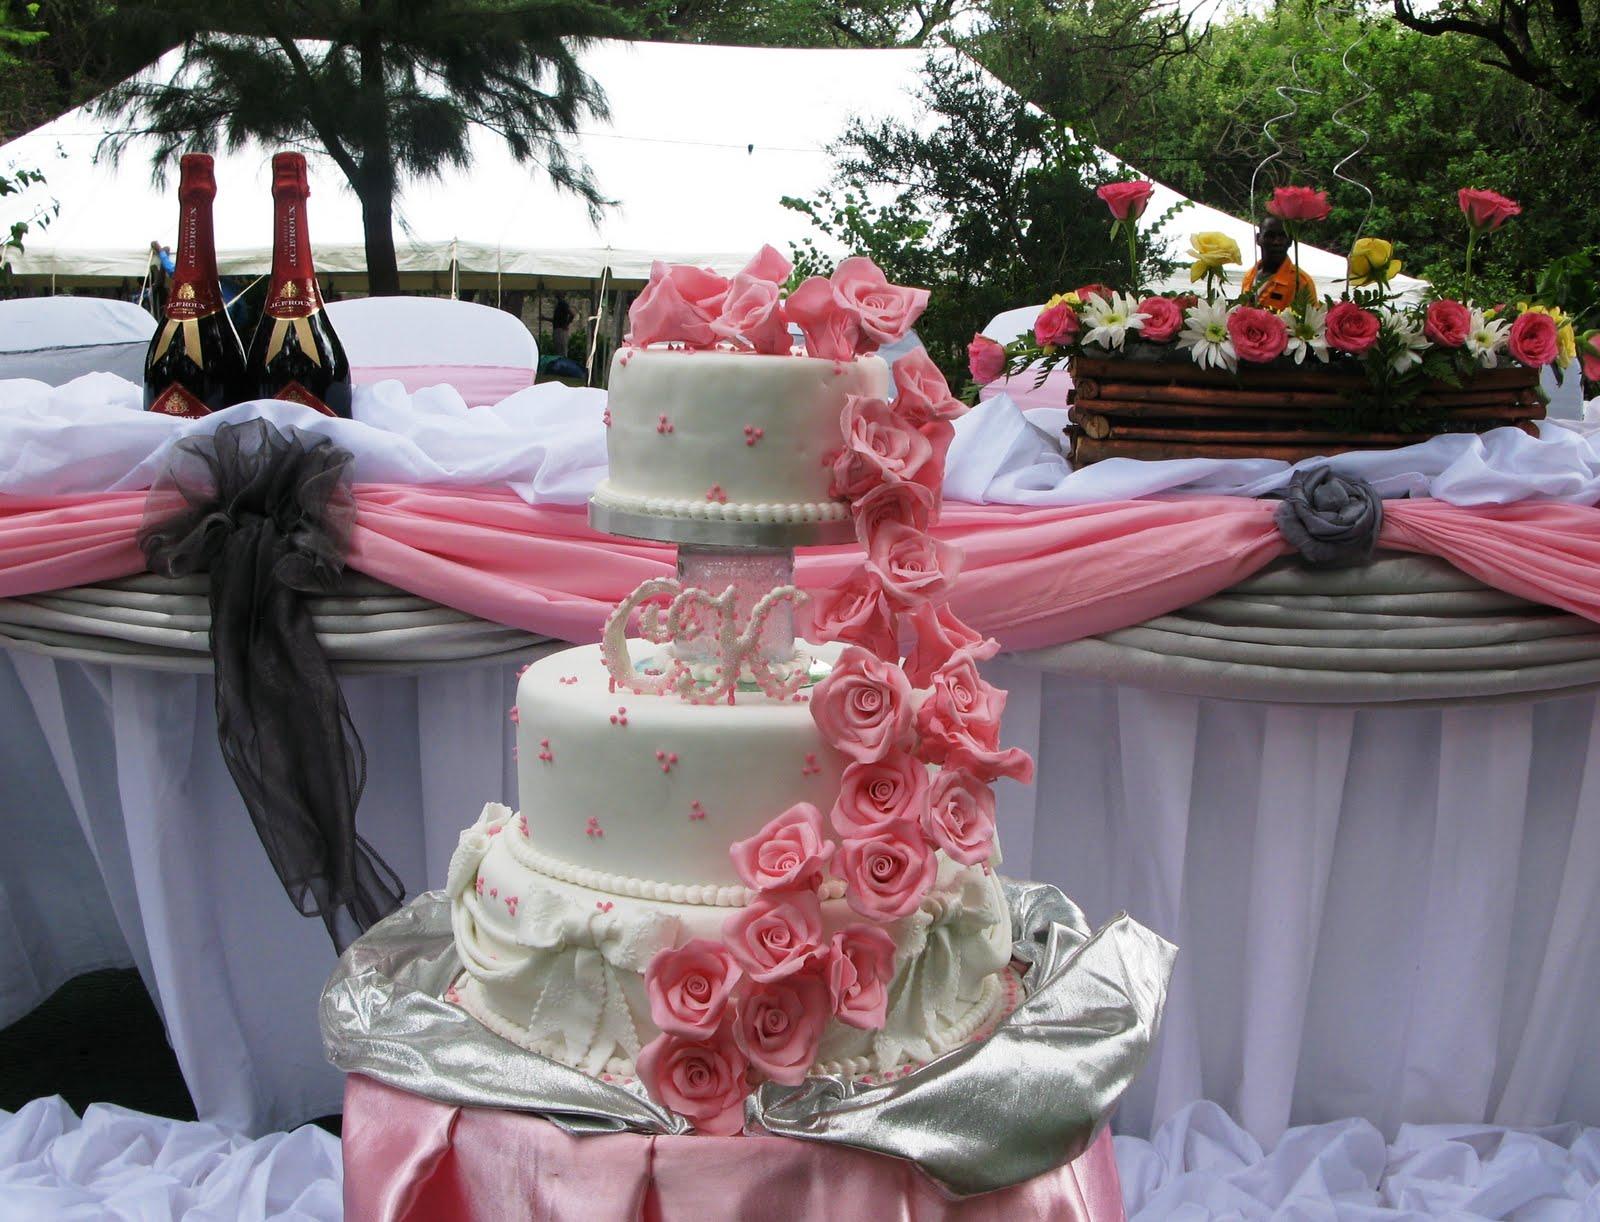 This three-tier wedding cake